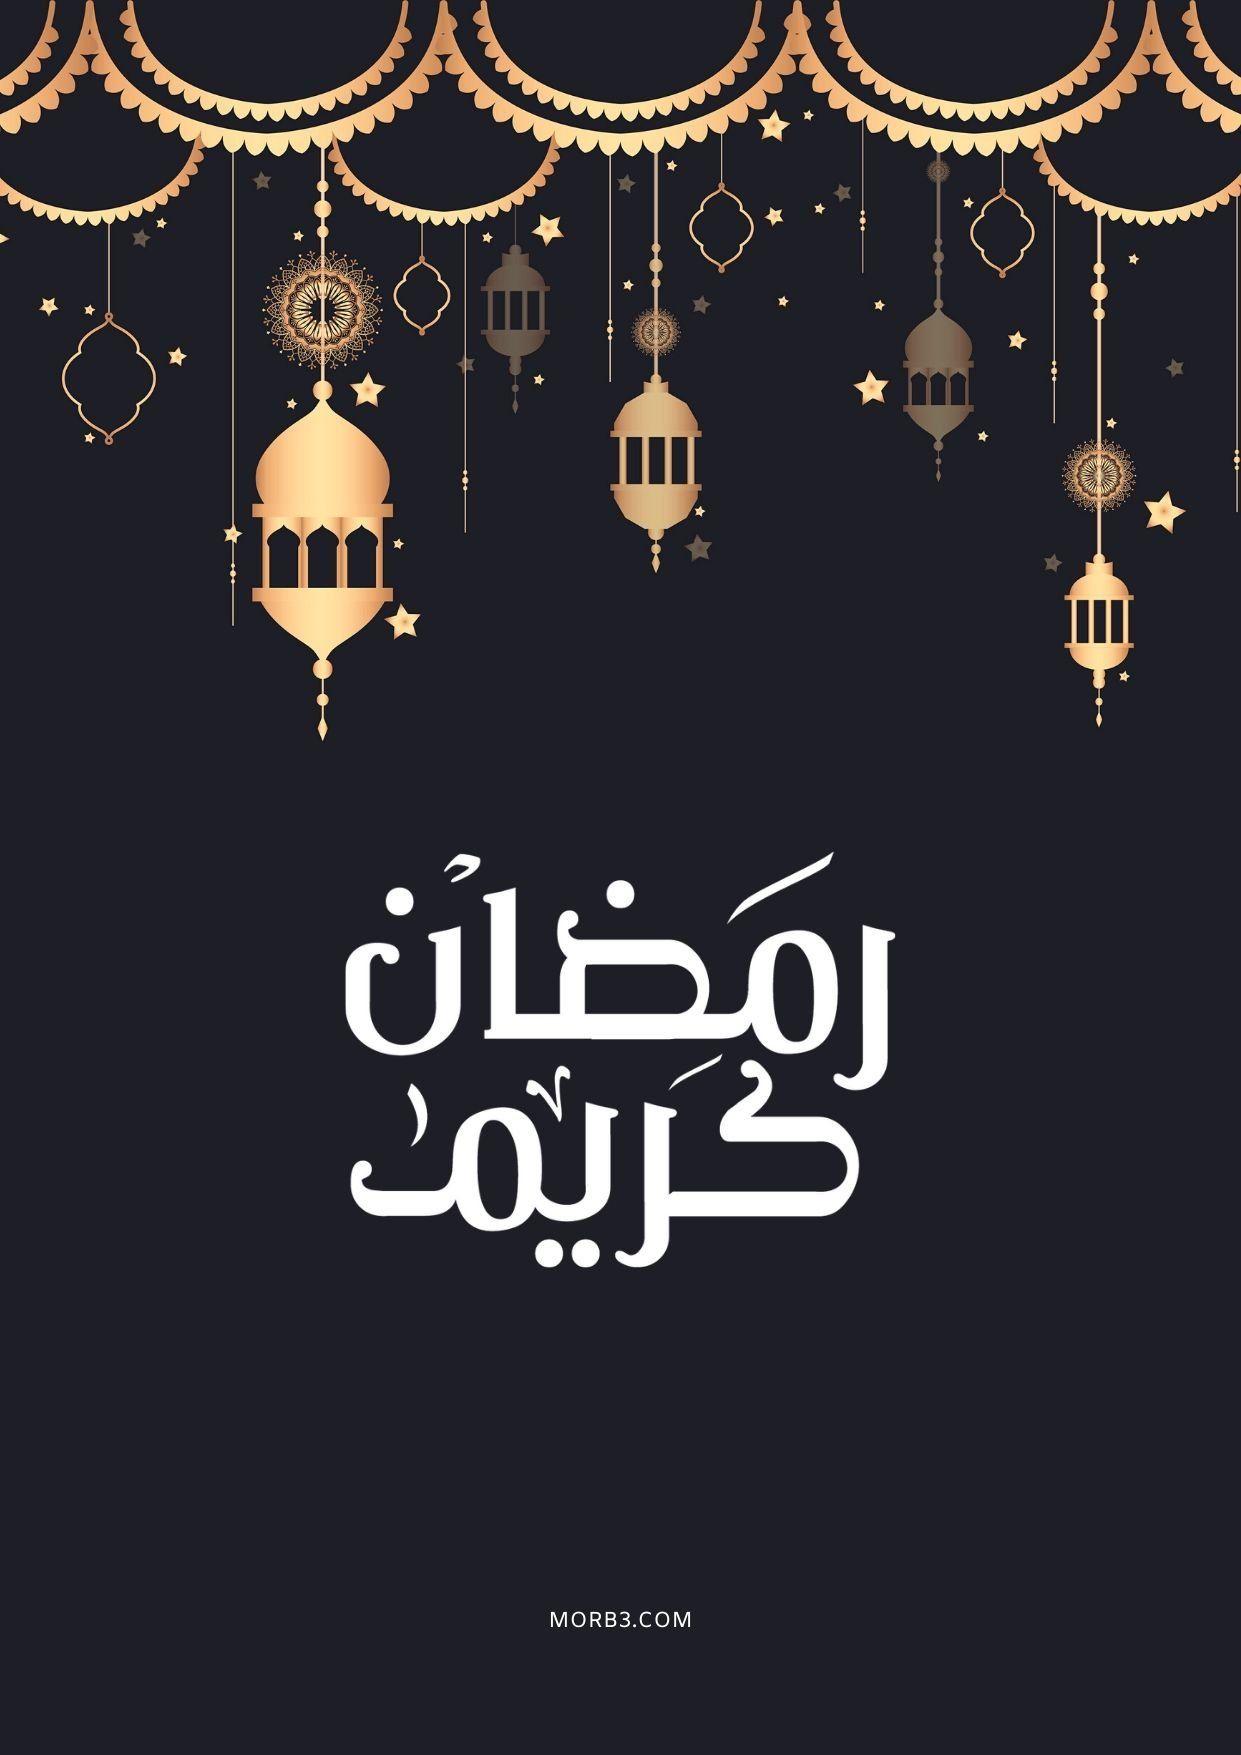 صور خلفيات رمضان كريم مبارك شهر رمضان خلفيات رمضانية للموبايل ايفون للجوال للفيس بوك للواتس خلفيات صور شهر رمضان تحميل خلفيات رمضان Islamic Images Poster Image